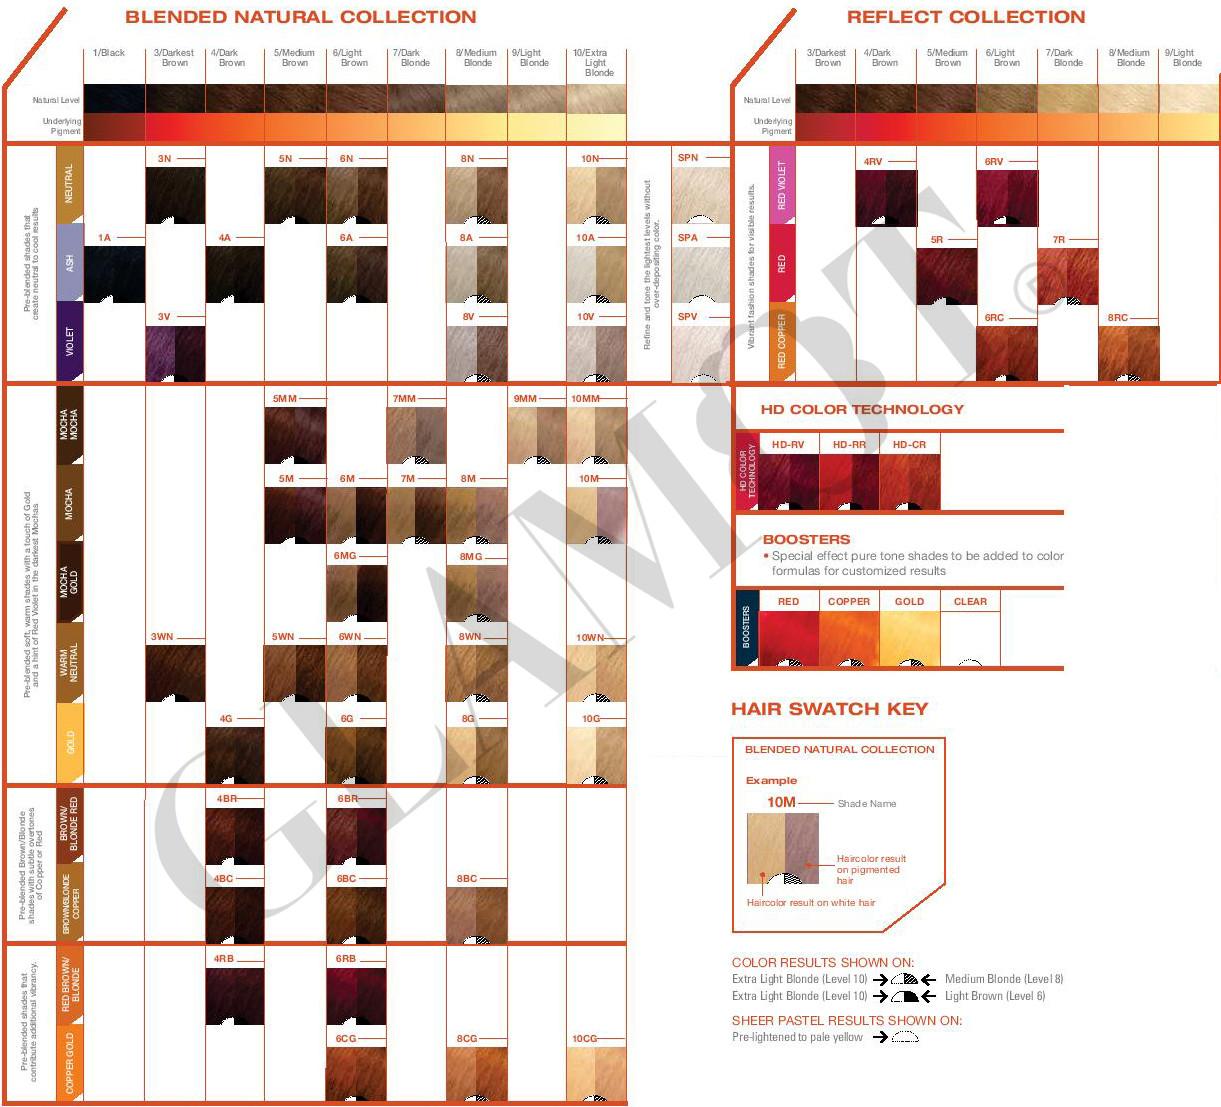 Matrix Color Sync Glamot Com